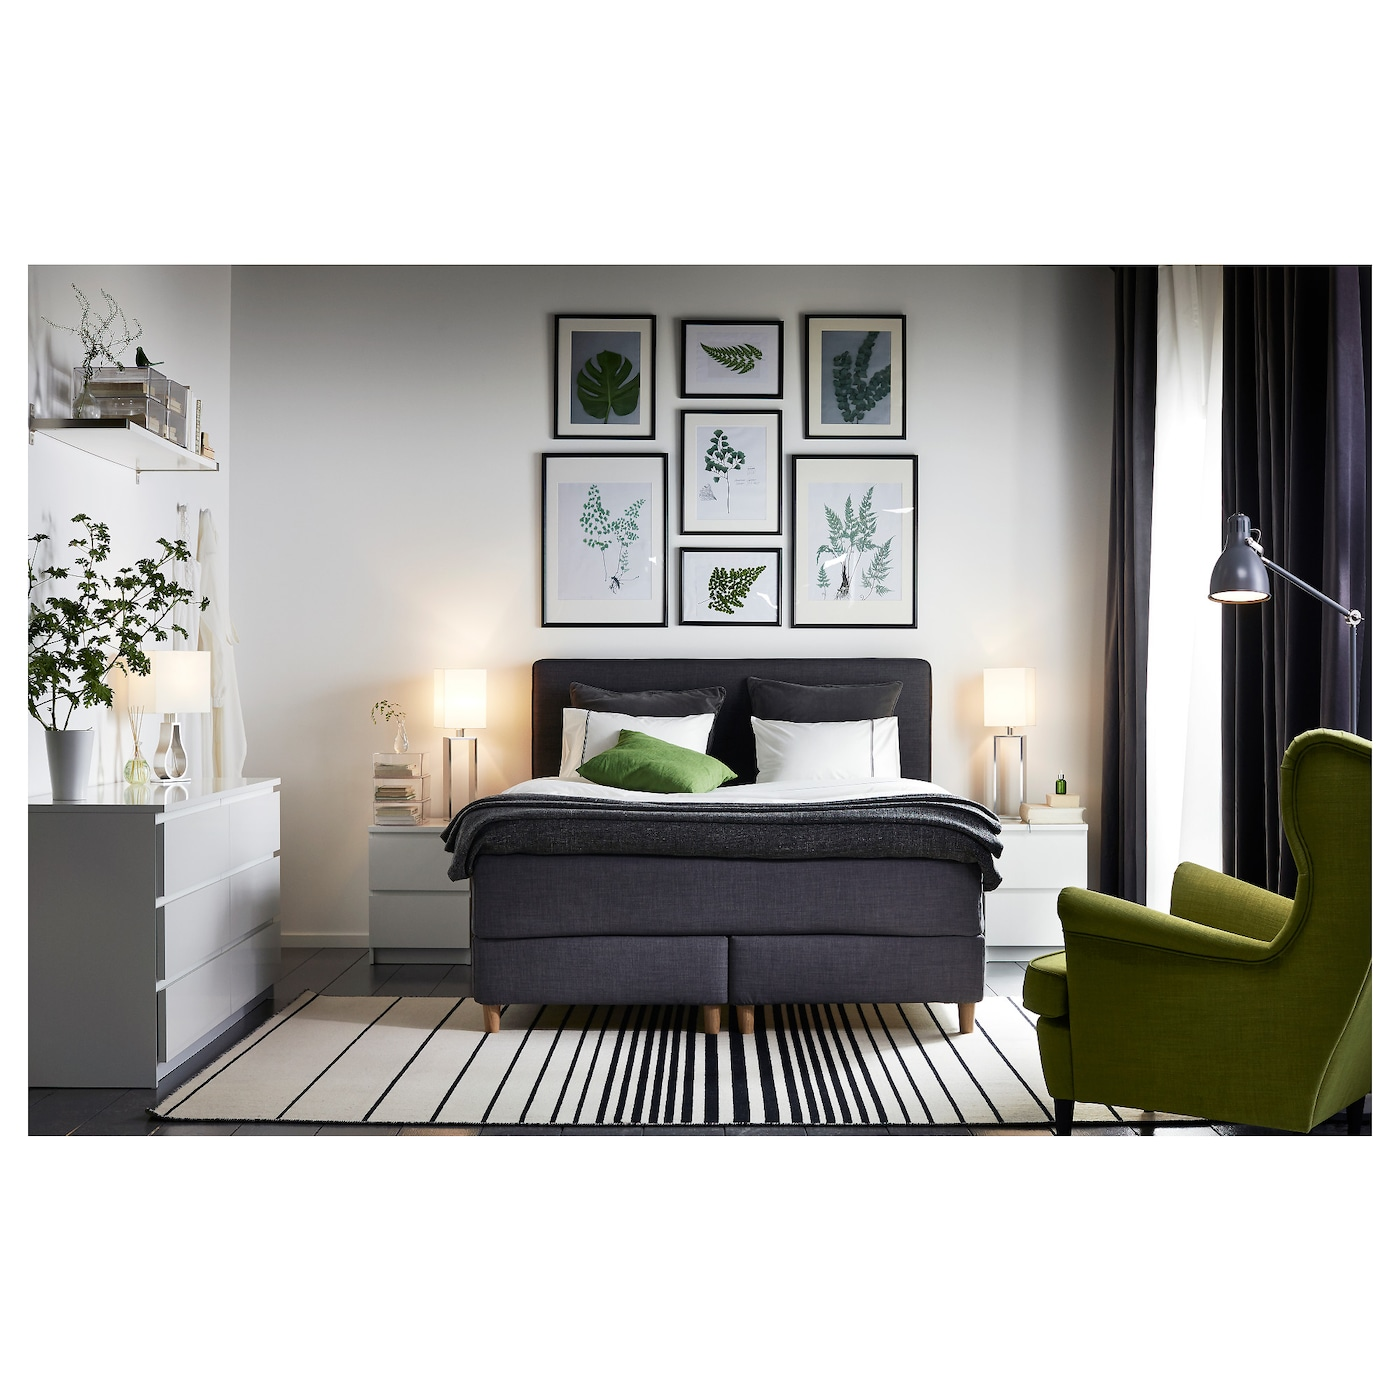 malm commode 6 tiroirs blanc 160 x 78 cm ikea. Black Bedroom Furniture Sets. Home Design Ideas